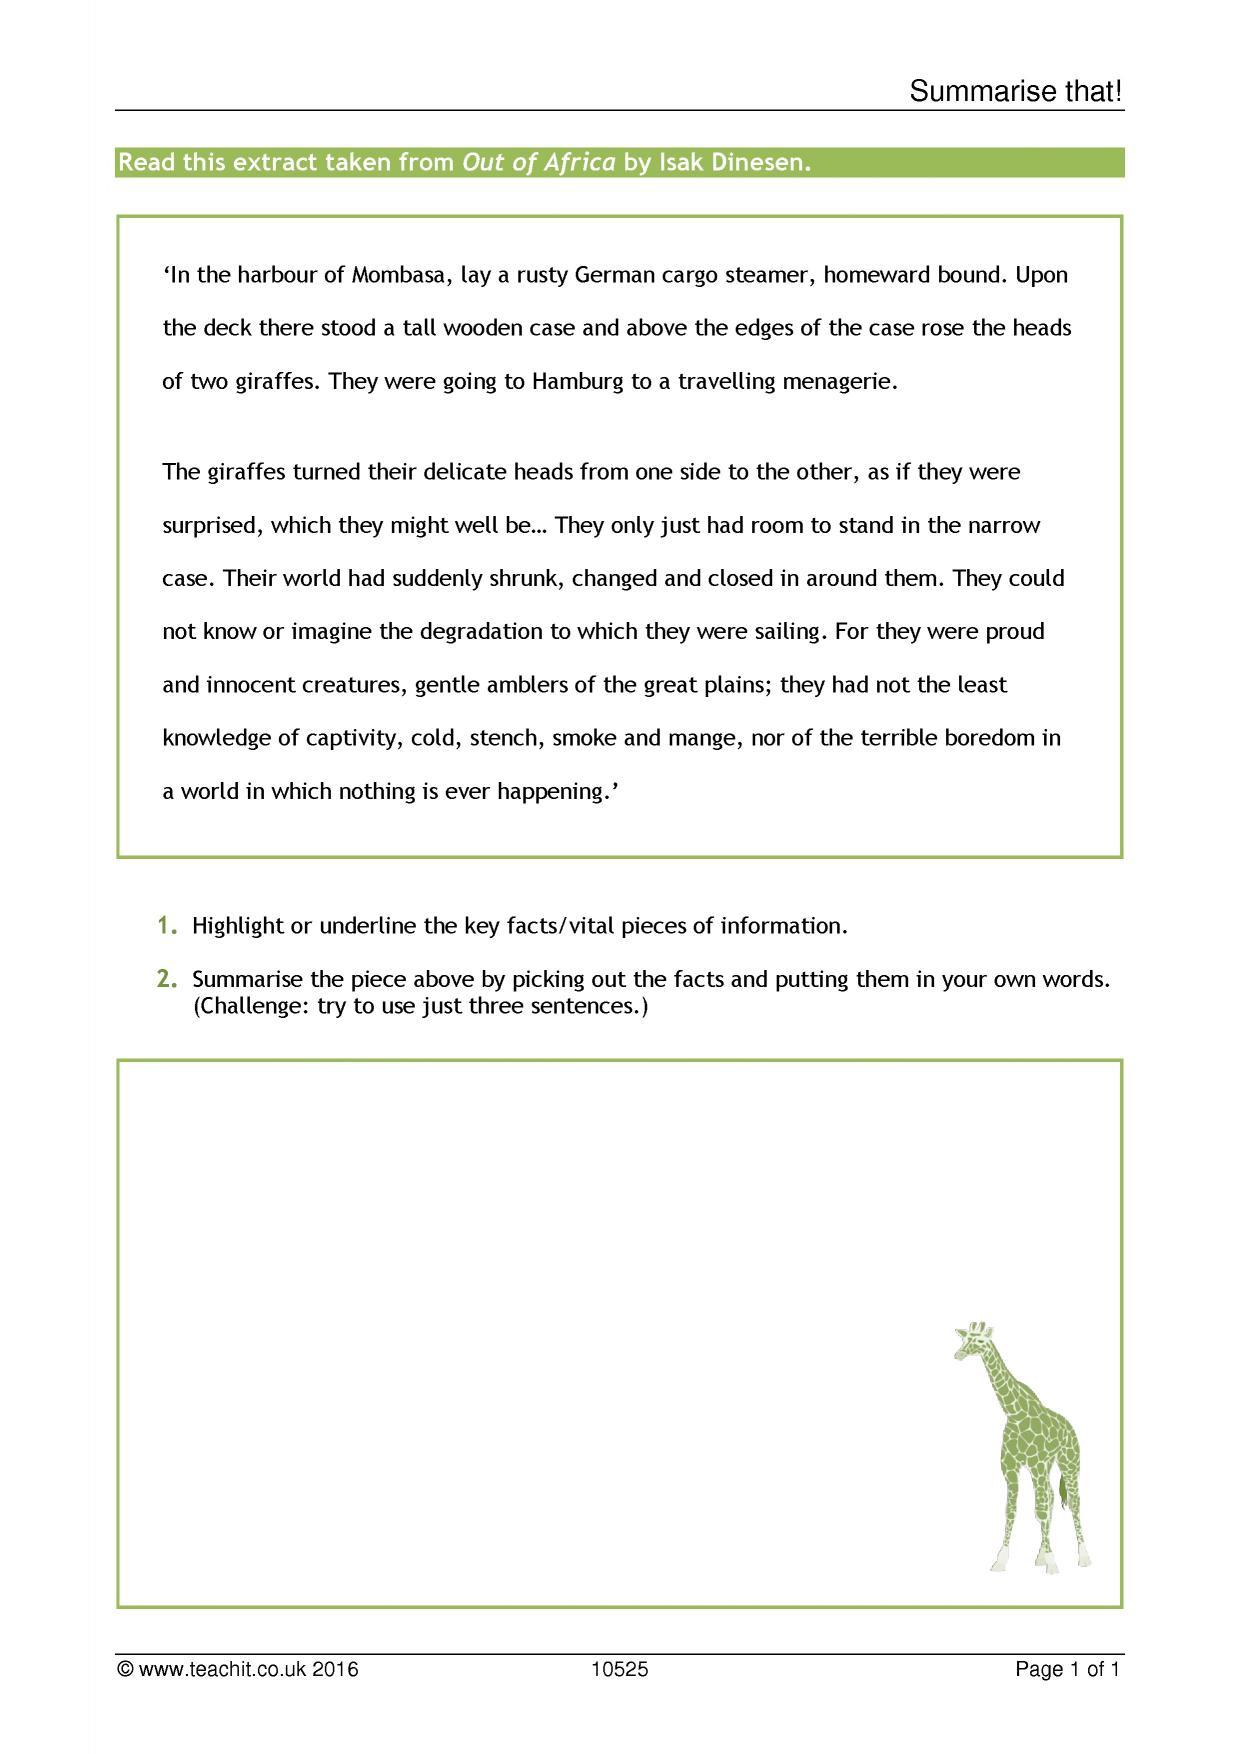 Worksheets Worksheets On Summarizing summarise that starters summarising home resource thumbnail